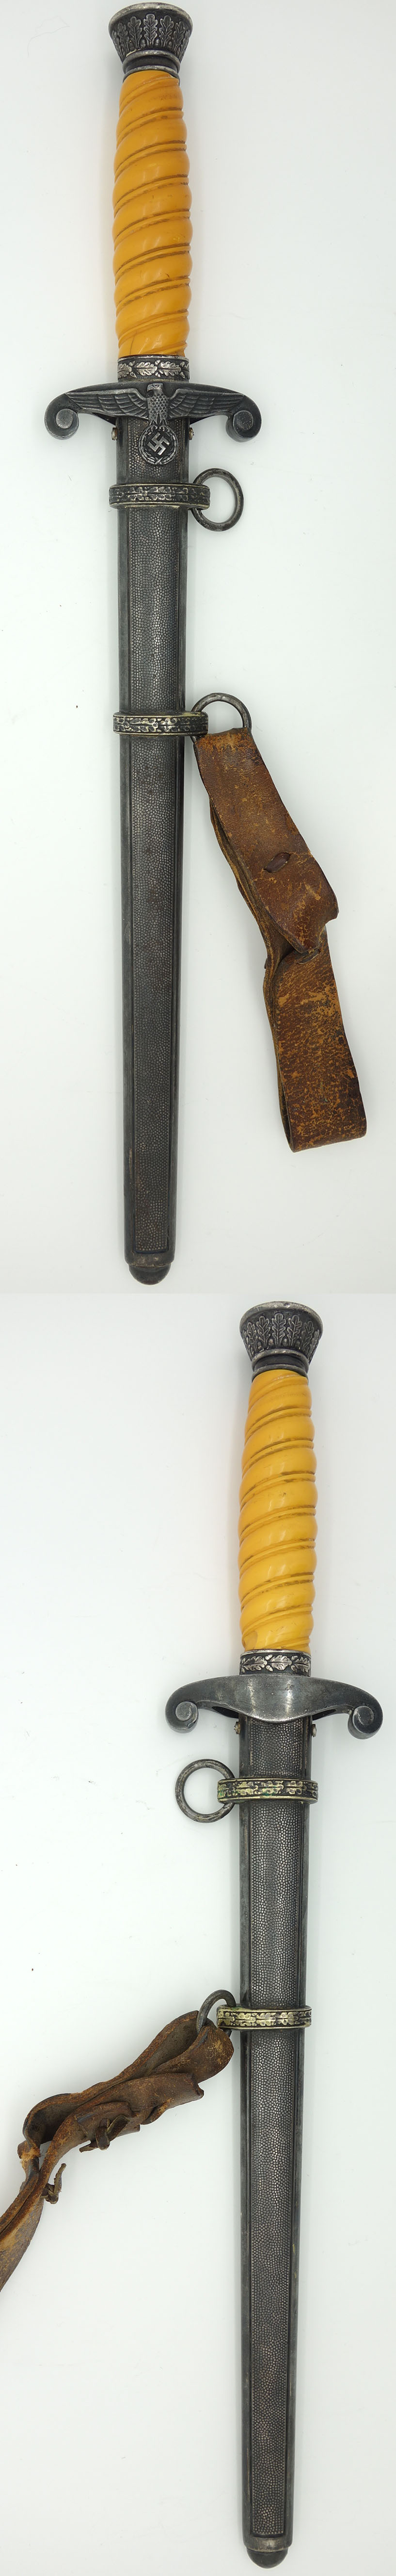 Robert Klaas Army Dagger